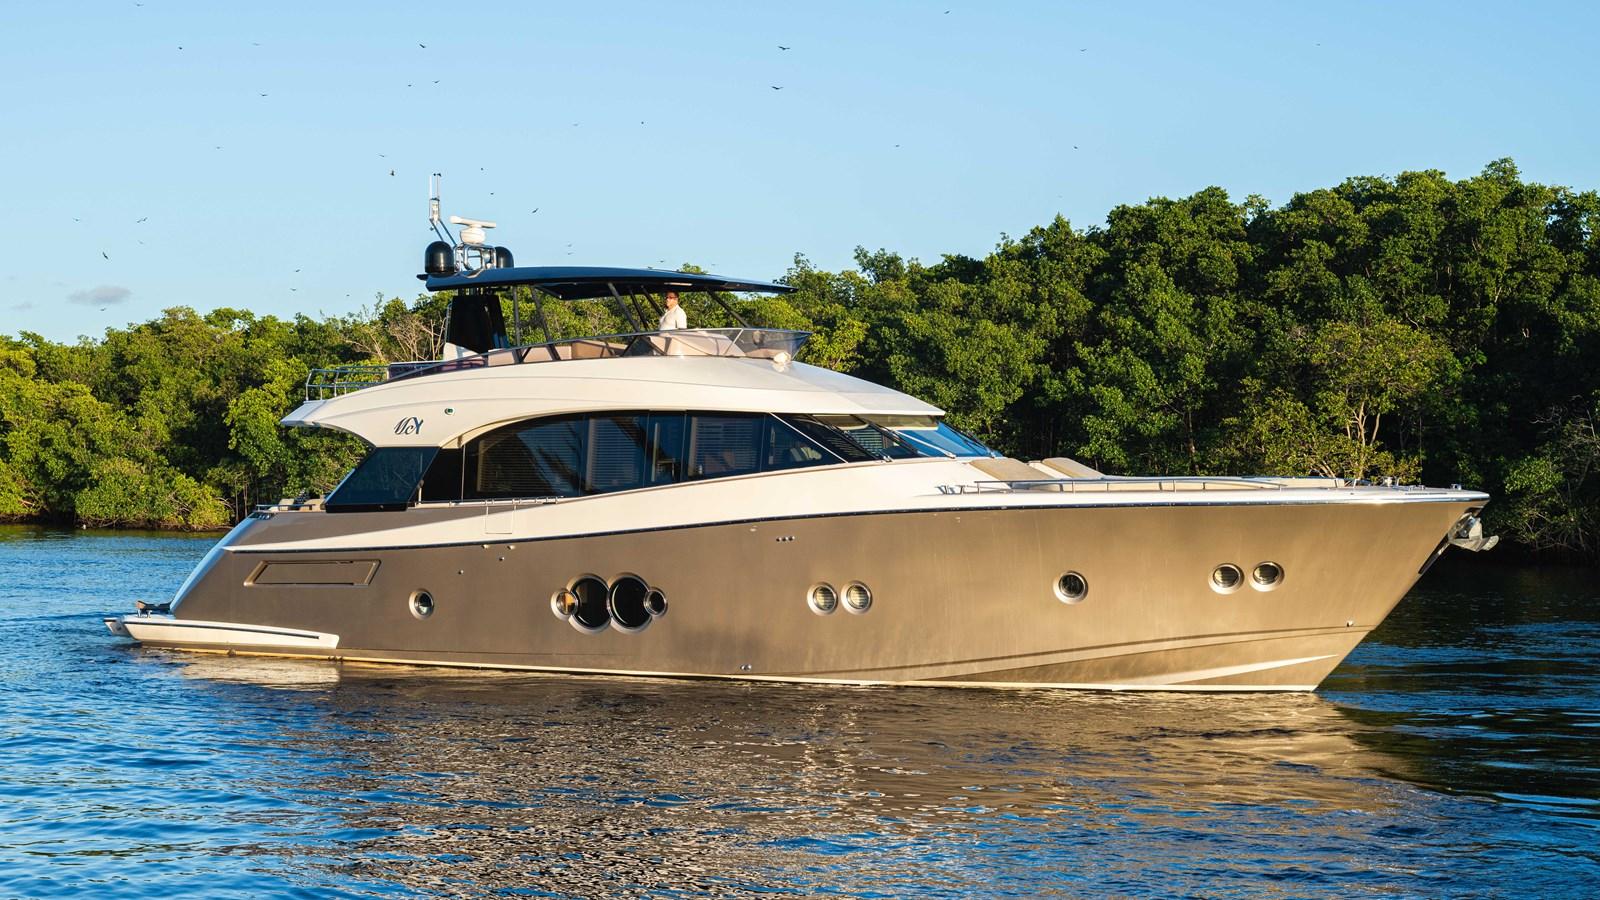 76 Monte Carlo (63 of 127) 2014 MONTE CARLO YACHTS Motoryacht Motor Yacht 2825002